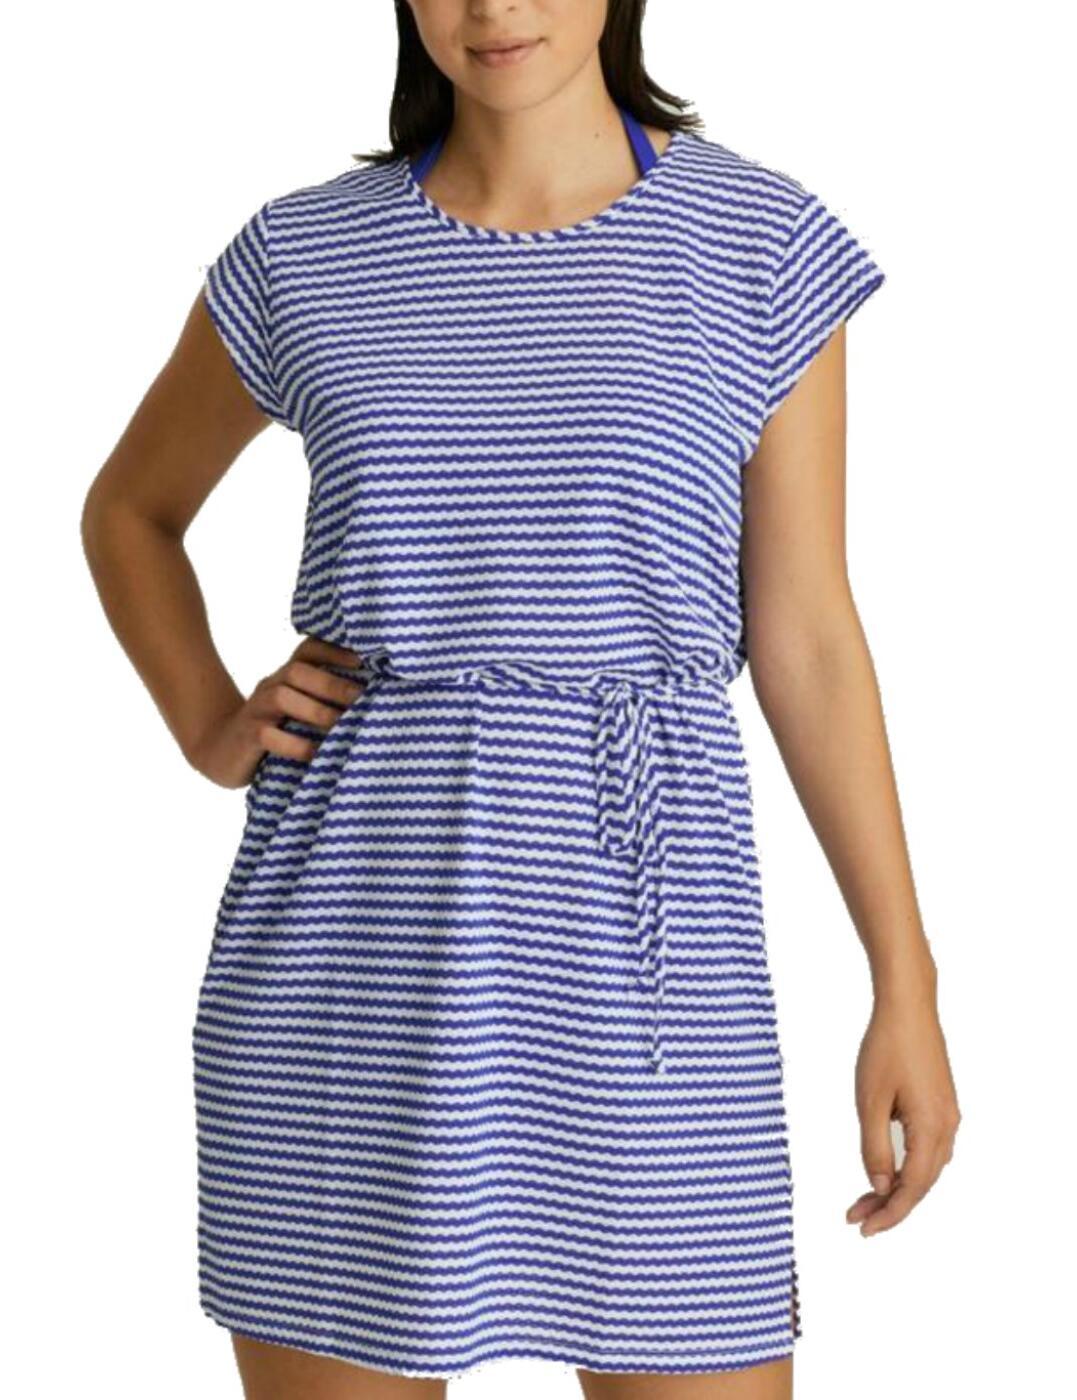 4006380 Prima Donna Swim Sahara Short Swimwear Dress - 4006380 Electric Blue